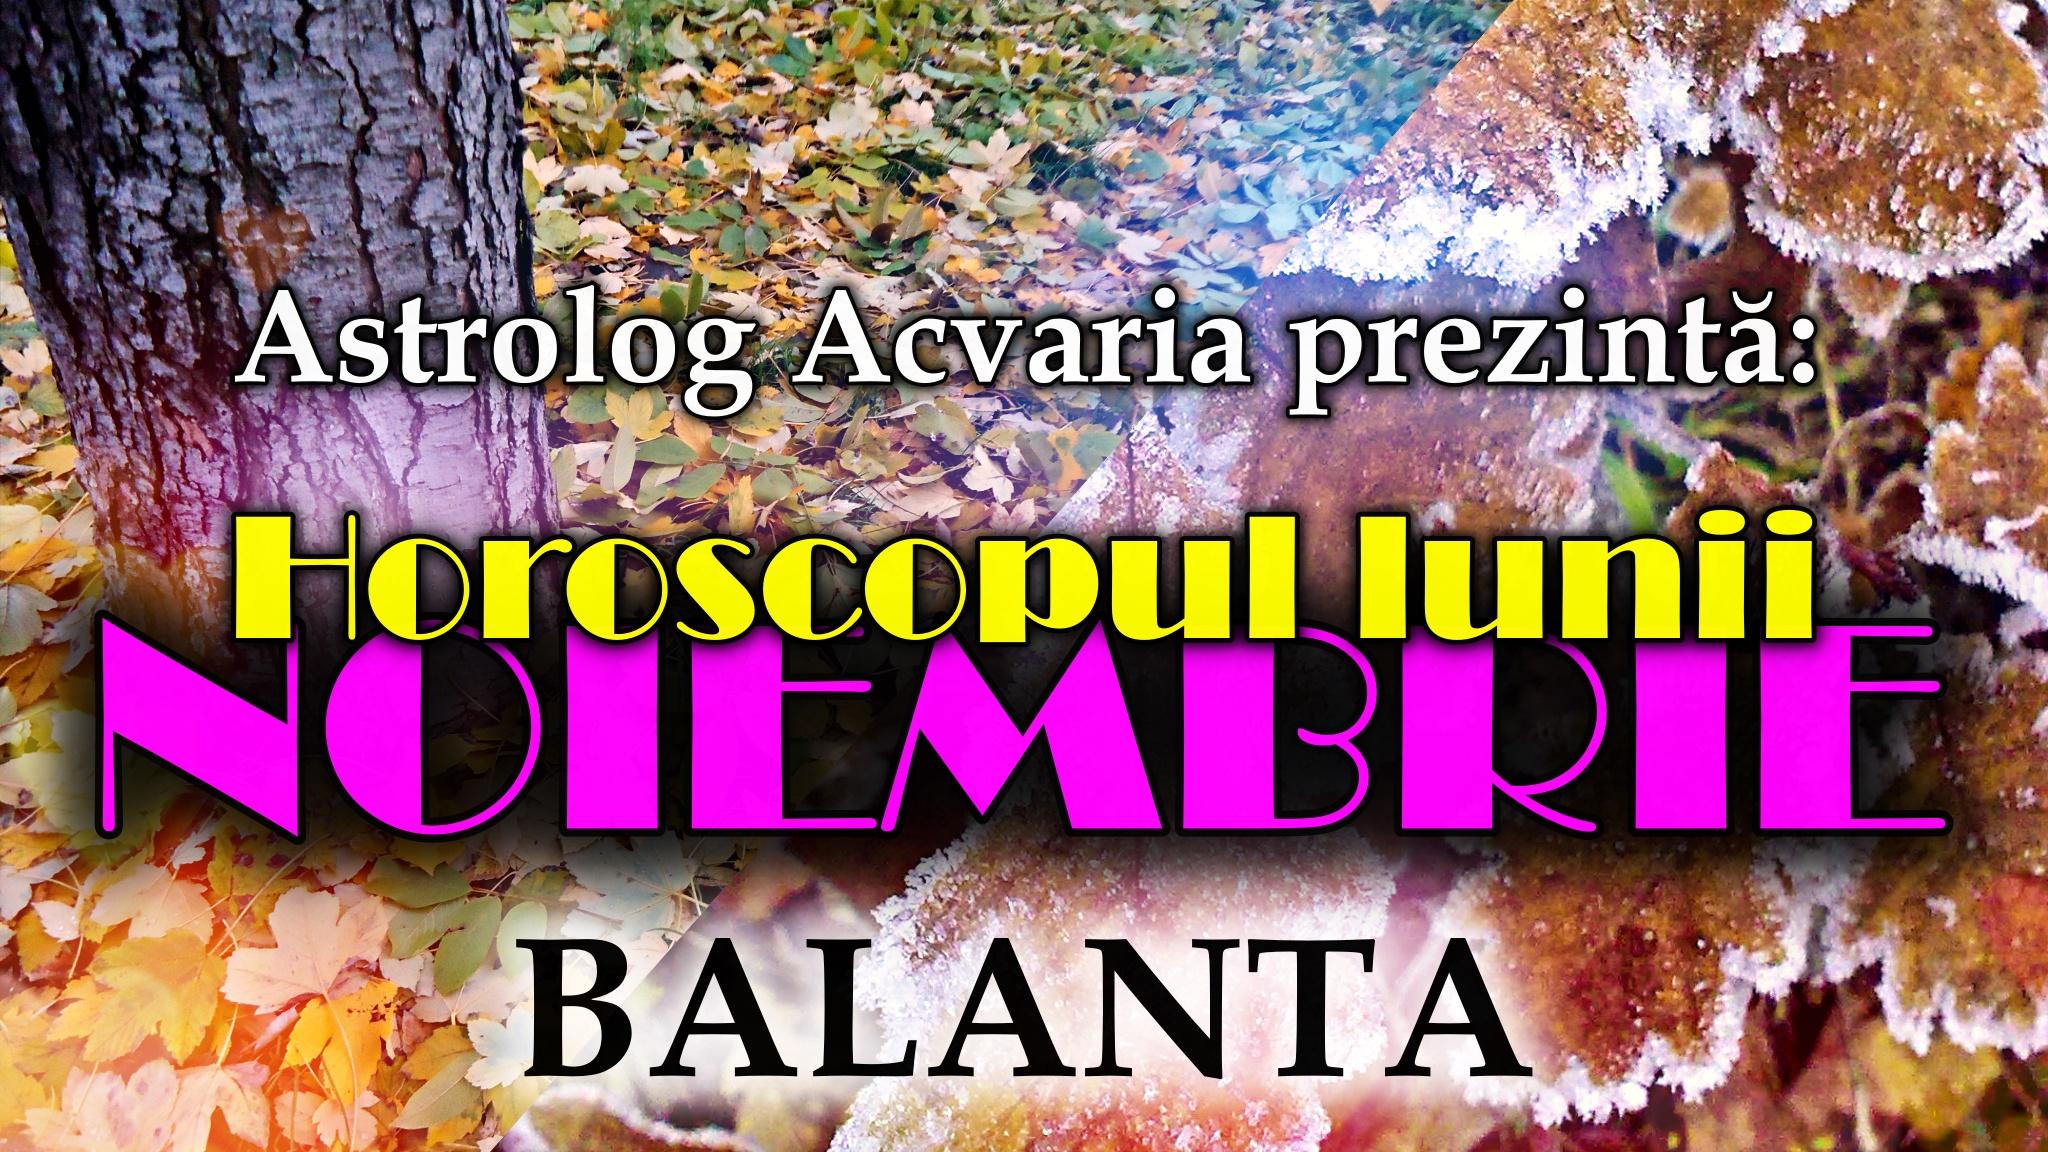 Horoscopul lunii NOIEMBRIE * Zodia BALANTEI